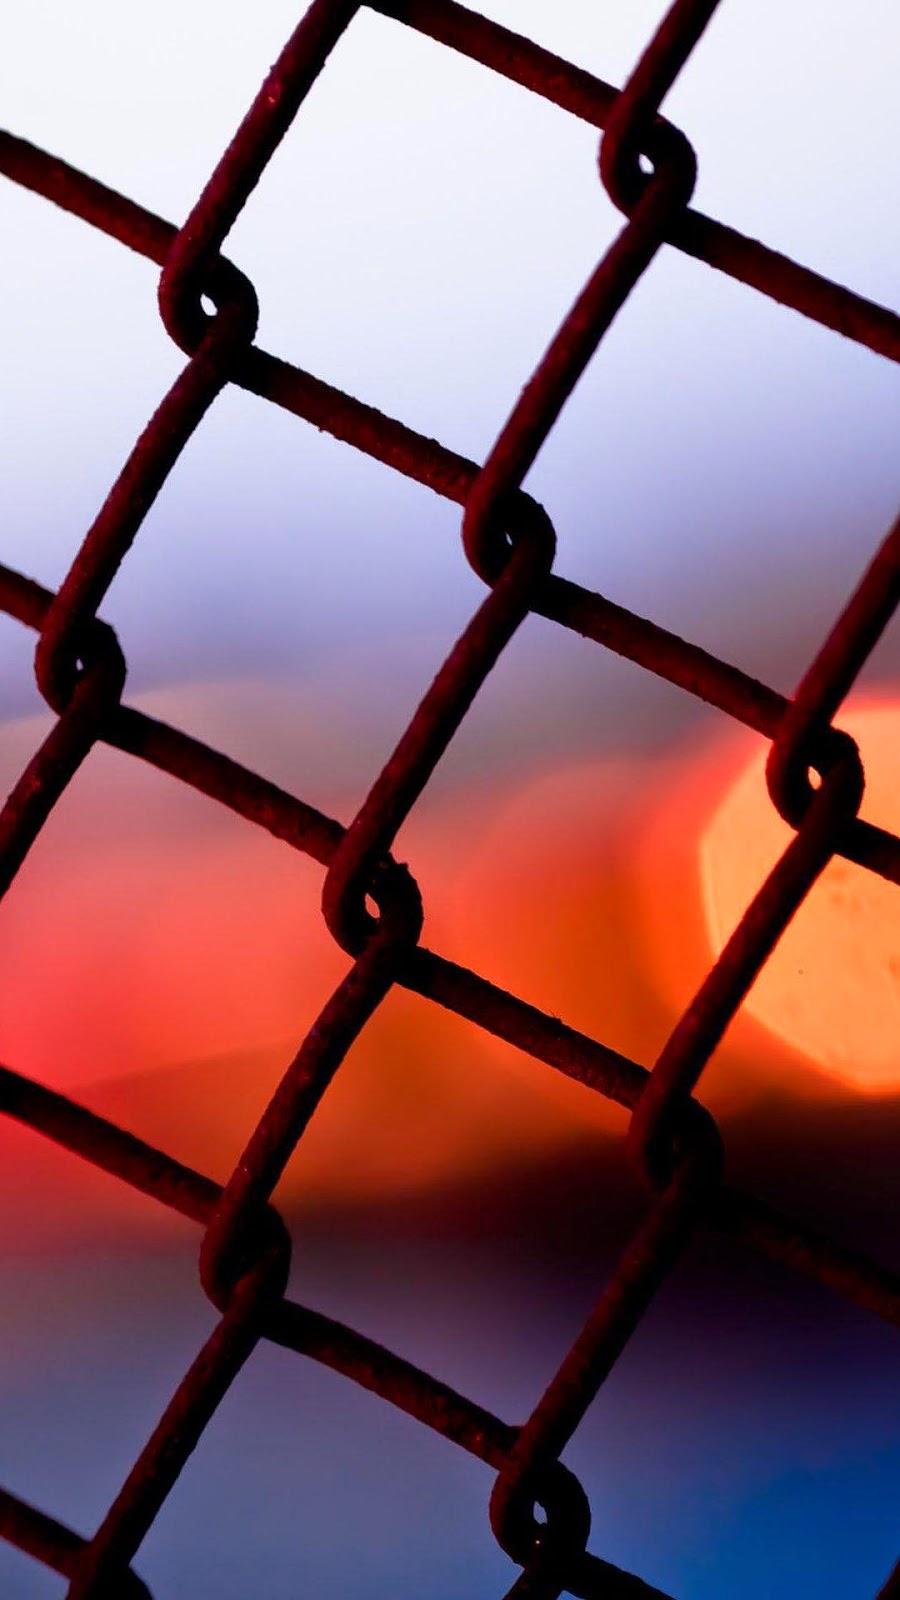 wallpaper iron fence - photo #32